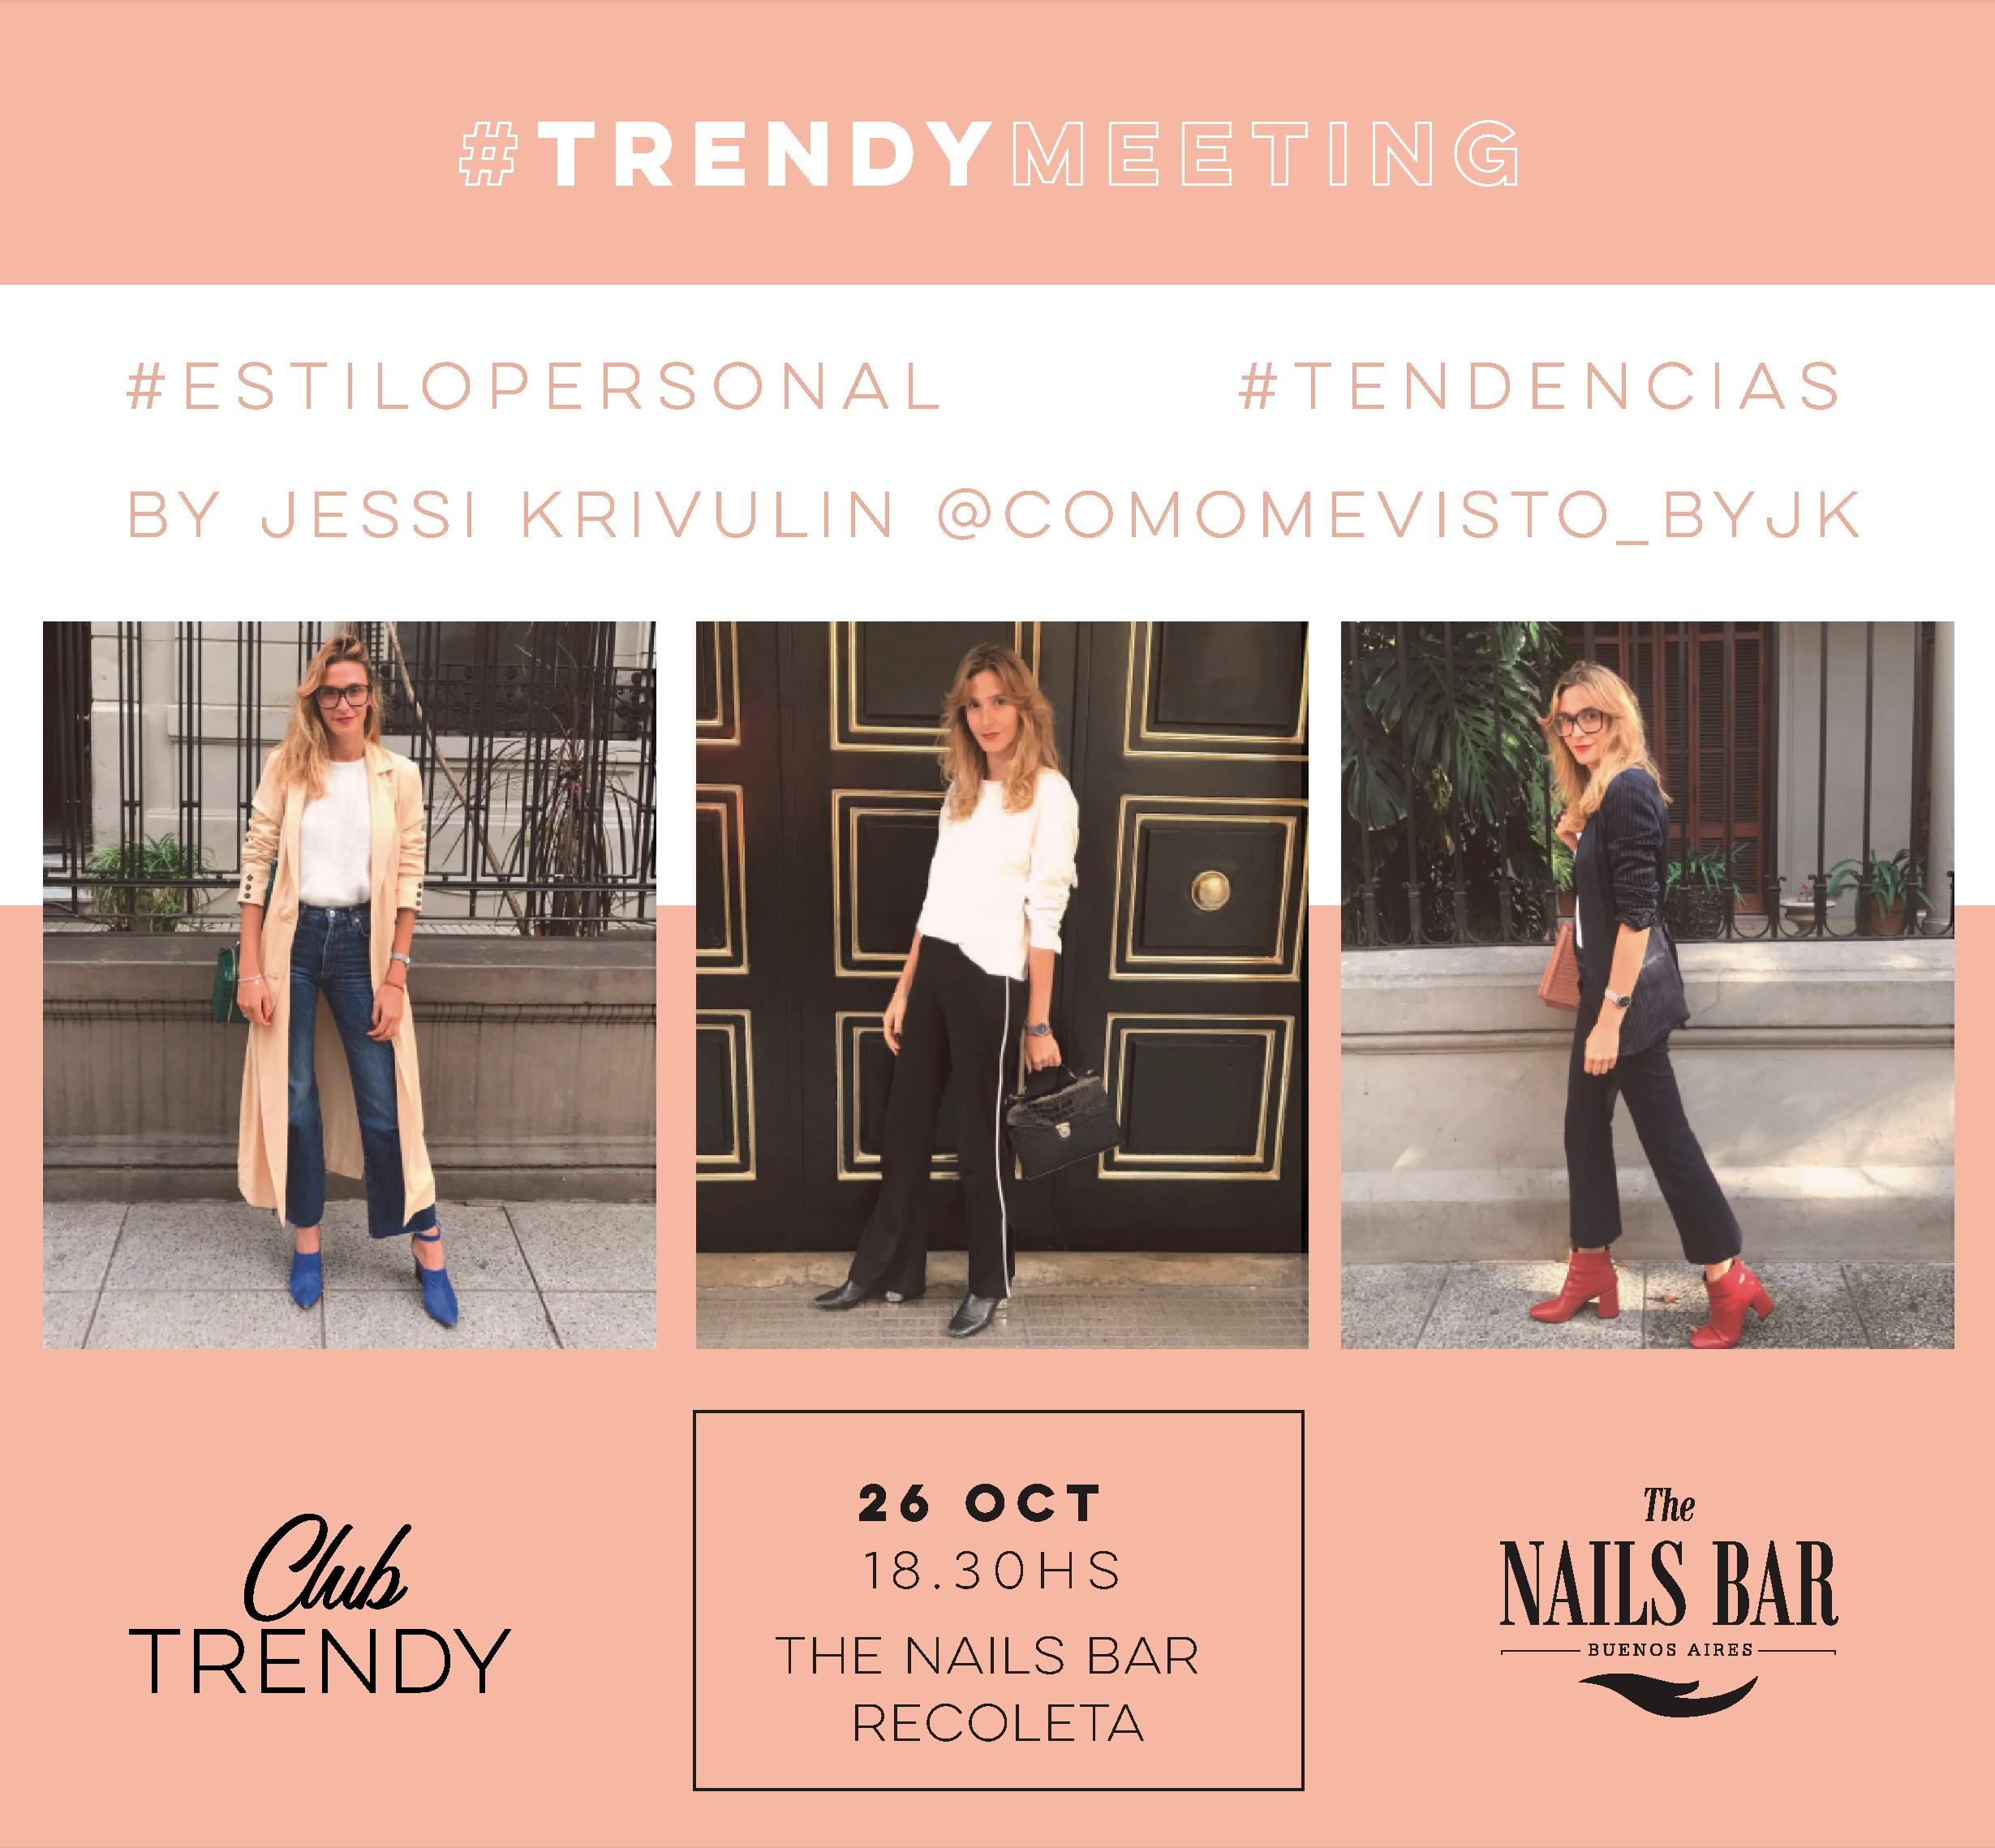 Trendy Meeting by Jessica Krivulin